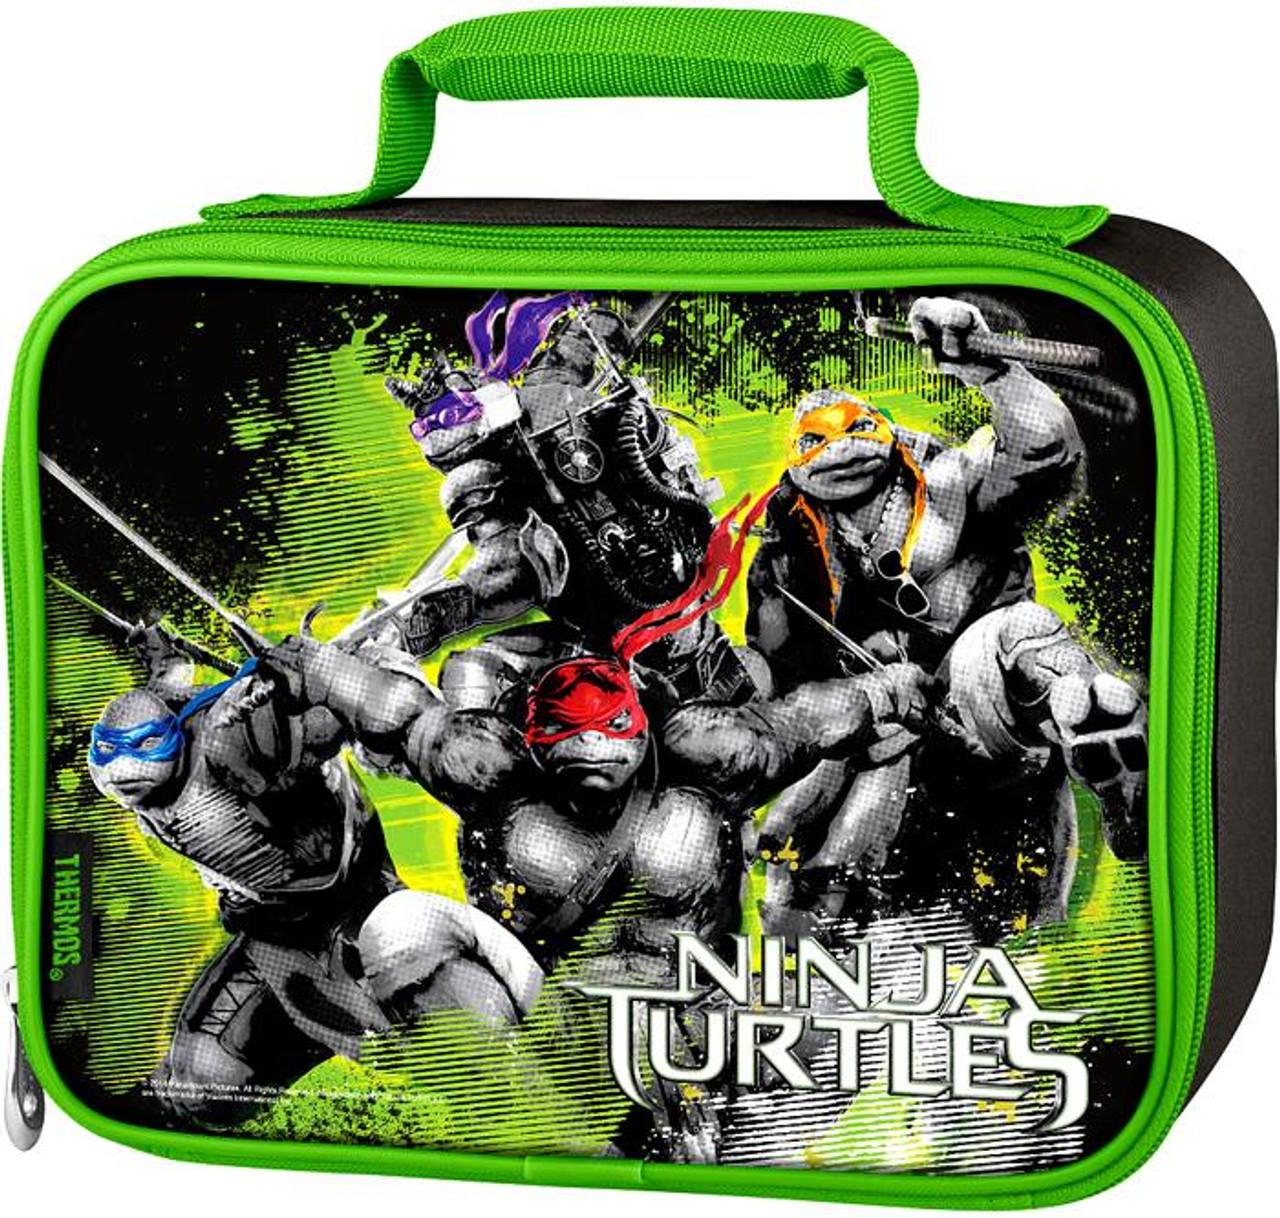 2014 Movie Teenage Mutant Ninja Turtles Lunch Tote [Insulated]